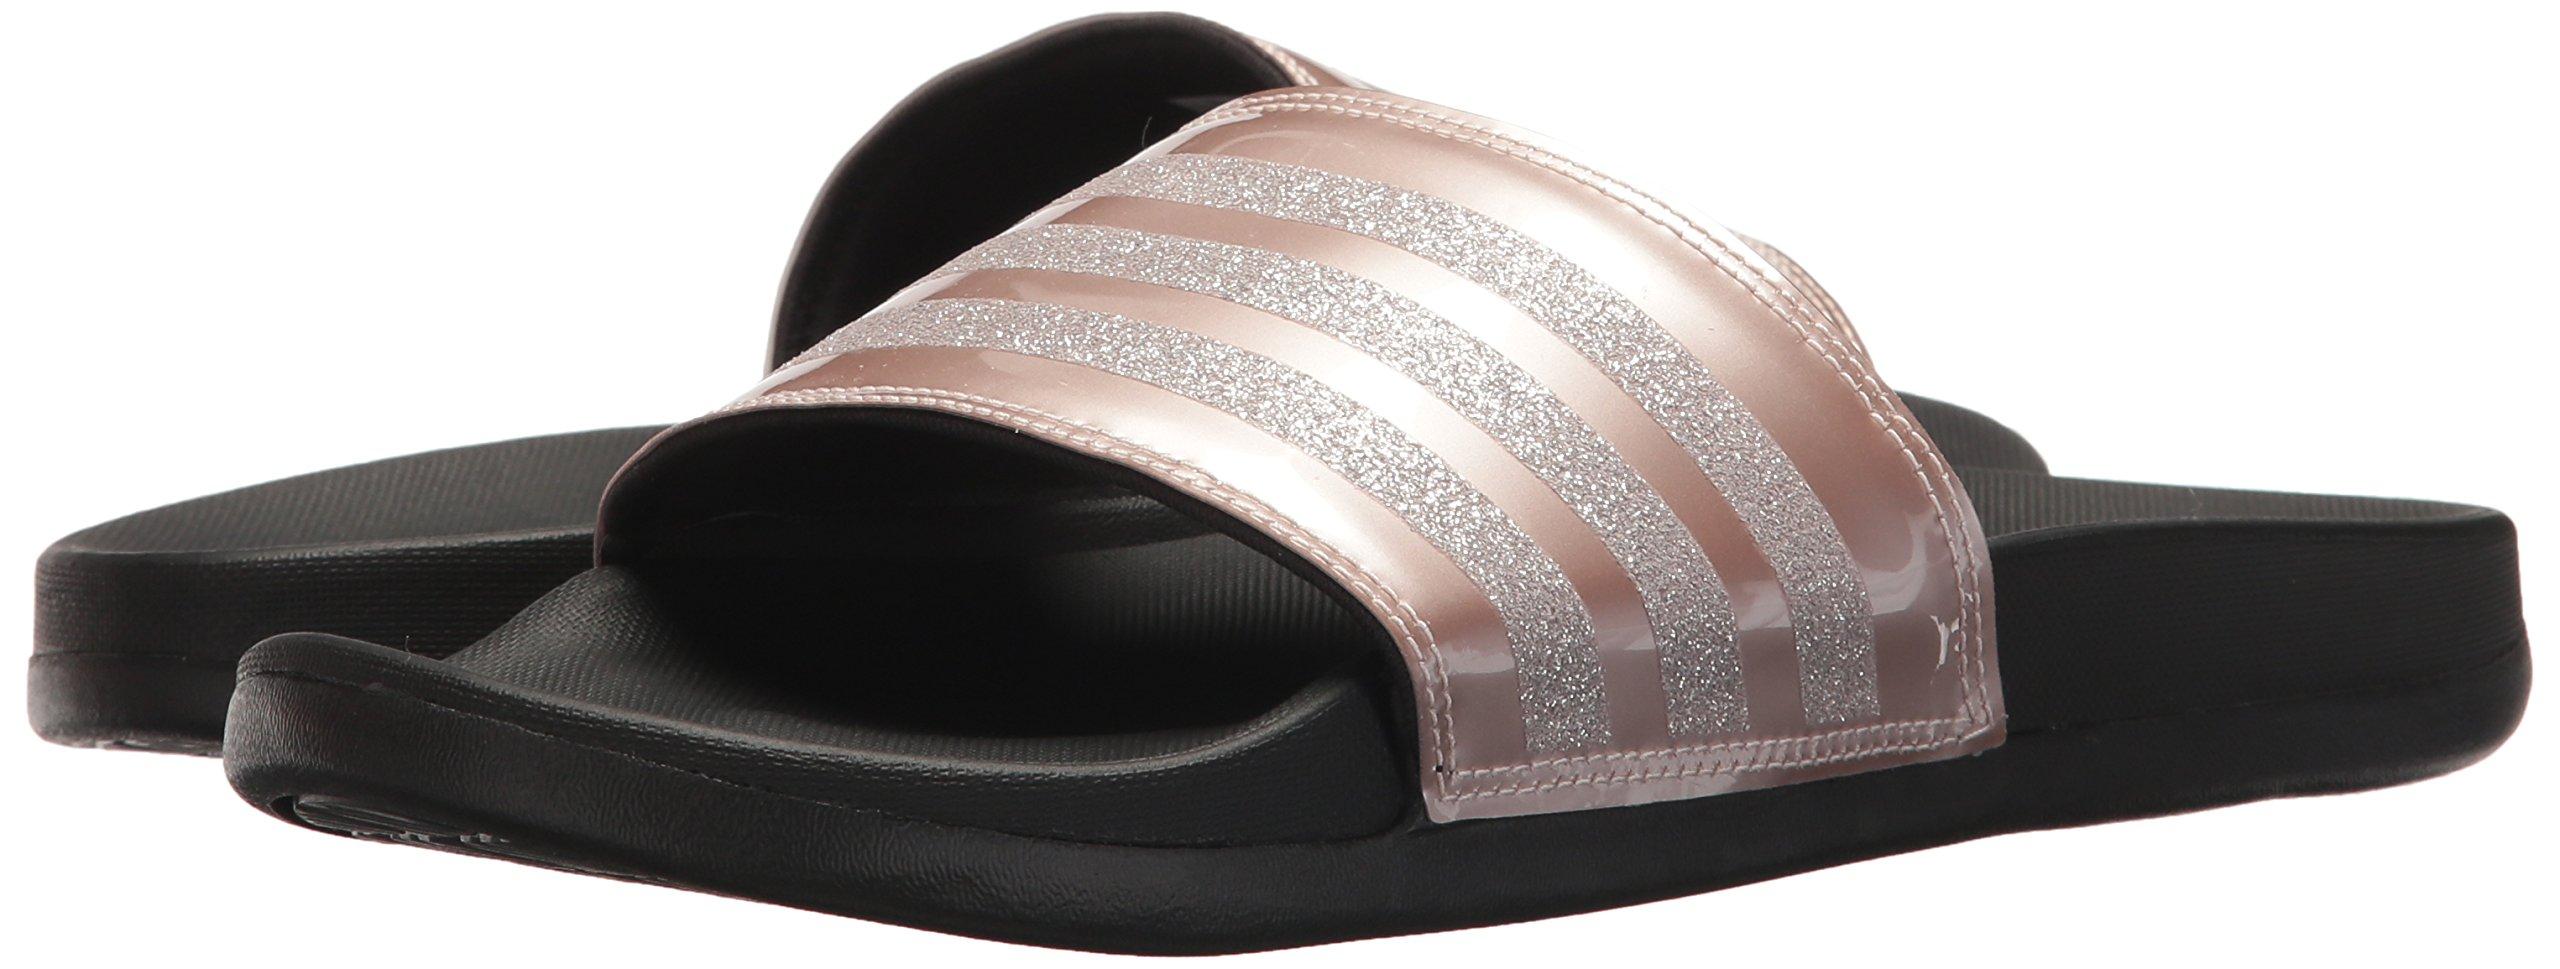 adidas Performance Women's Adilette CF+ Explorer W Sport Sandal, Vapour Grey Met, Vapour Grey Met.Fabric, Core Black, 9 M US by adidas (Image #6)